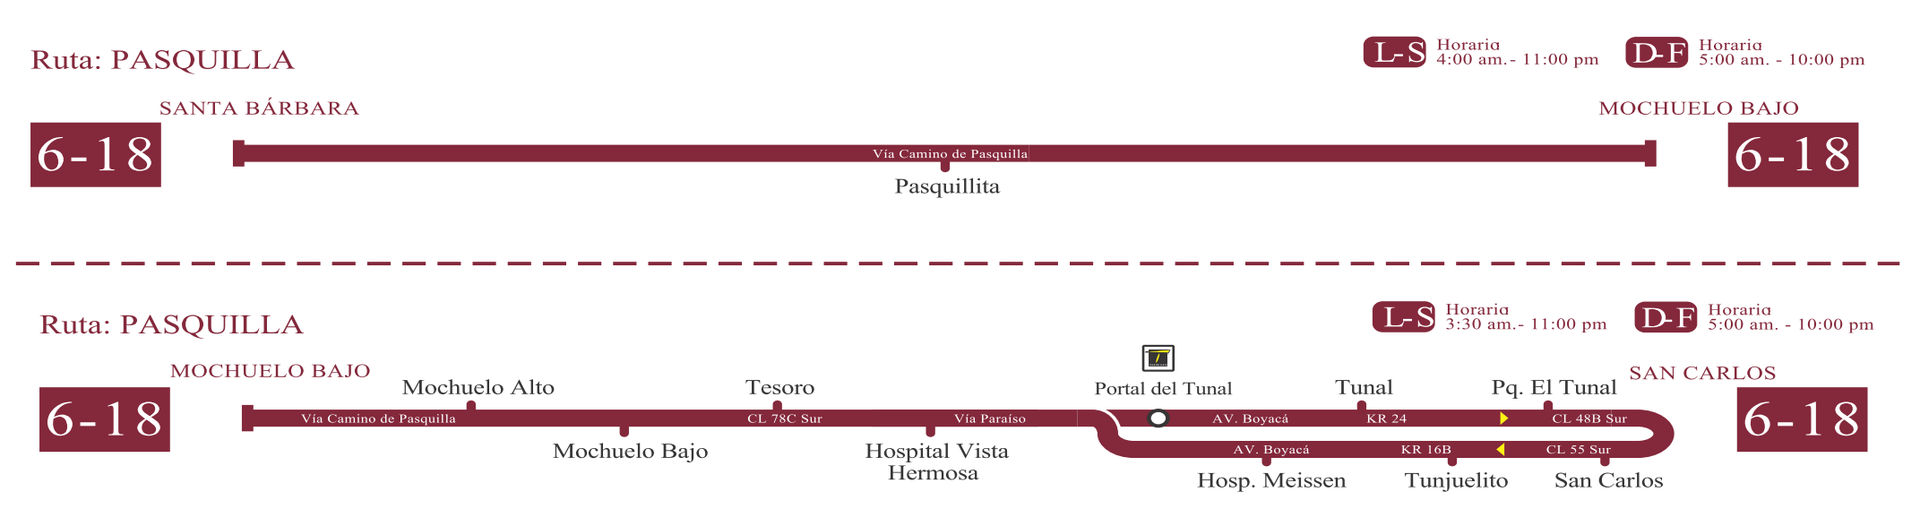 Ruta SITP: 6-18 → Pasquilla [Especial] 3